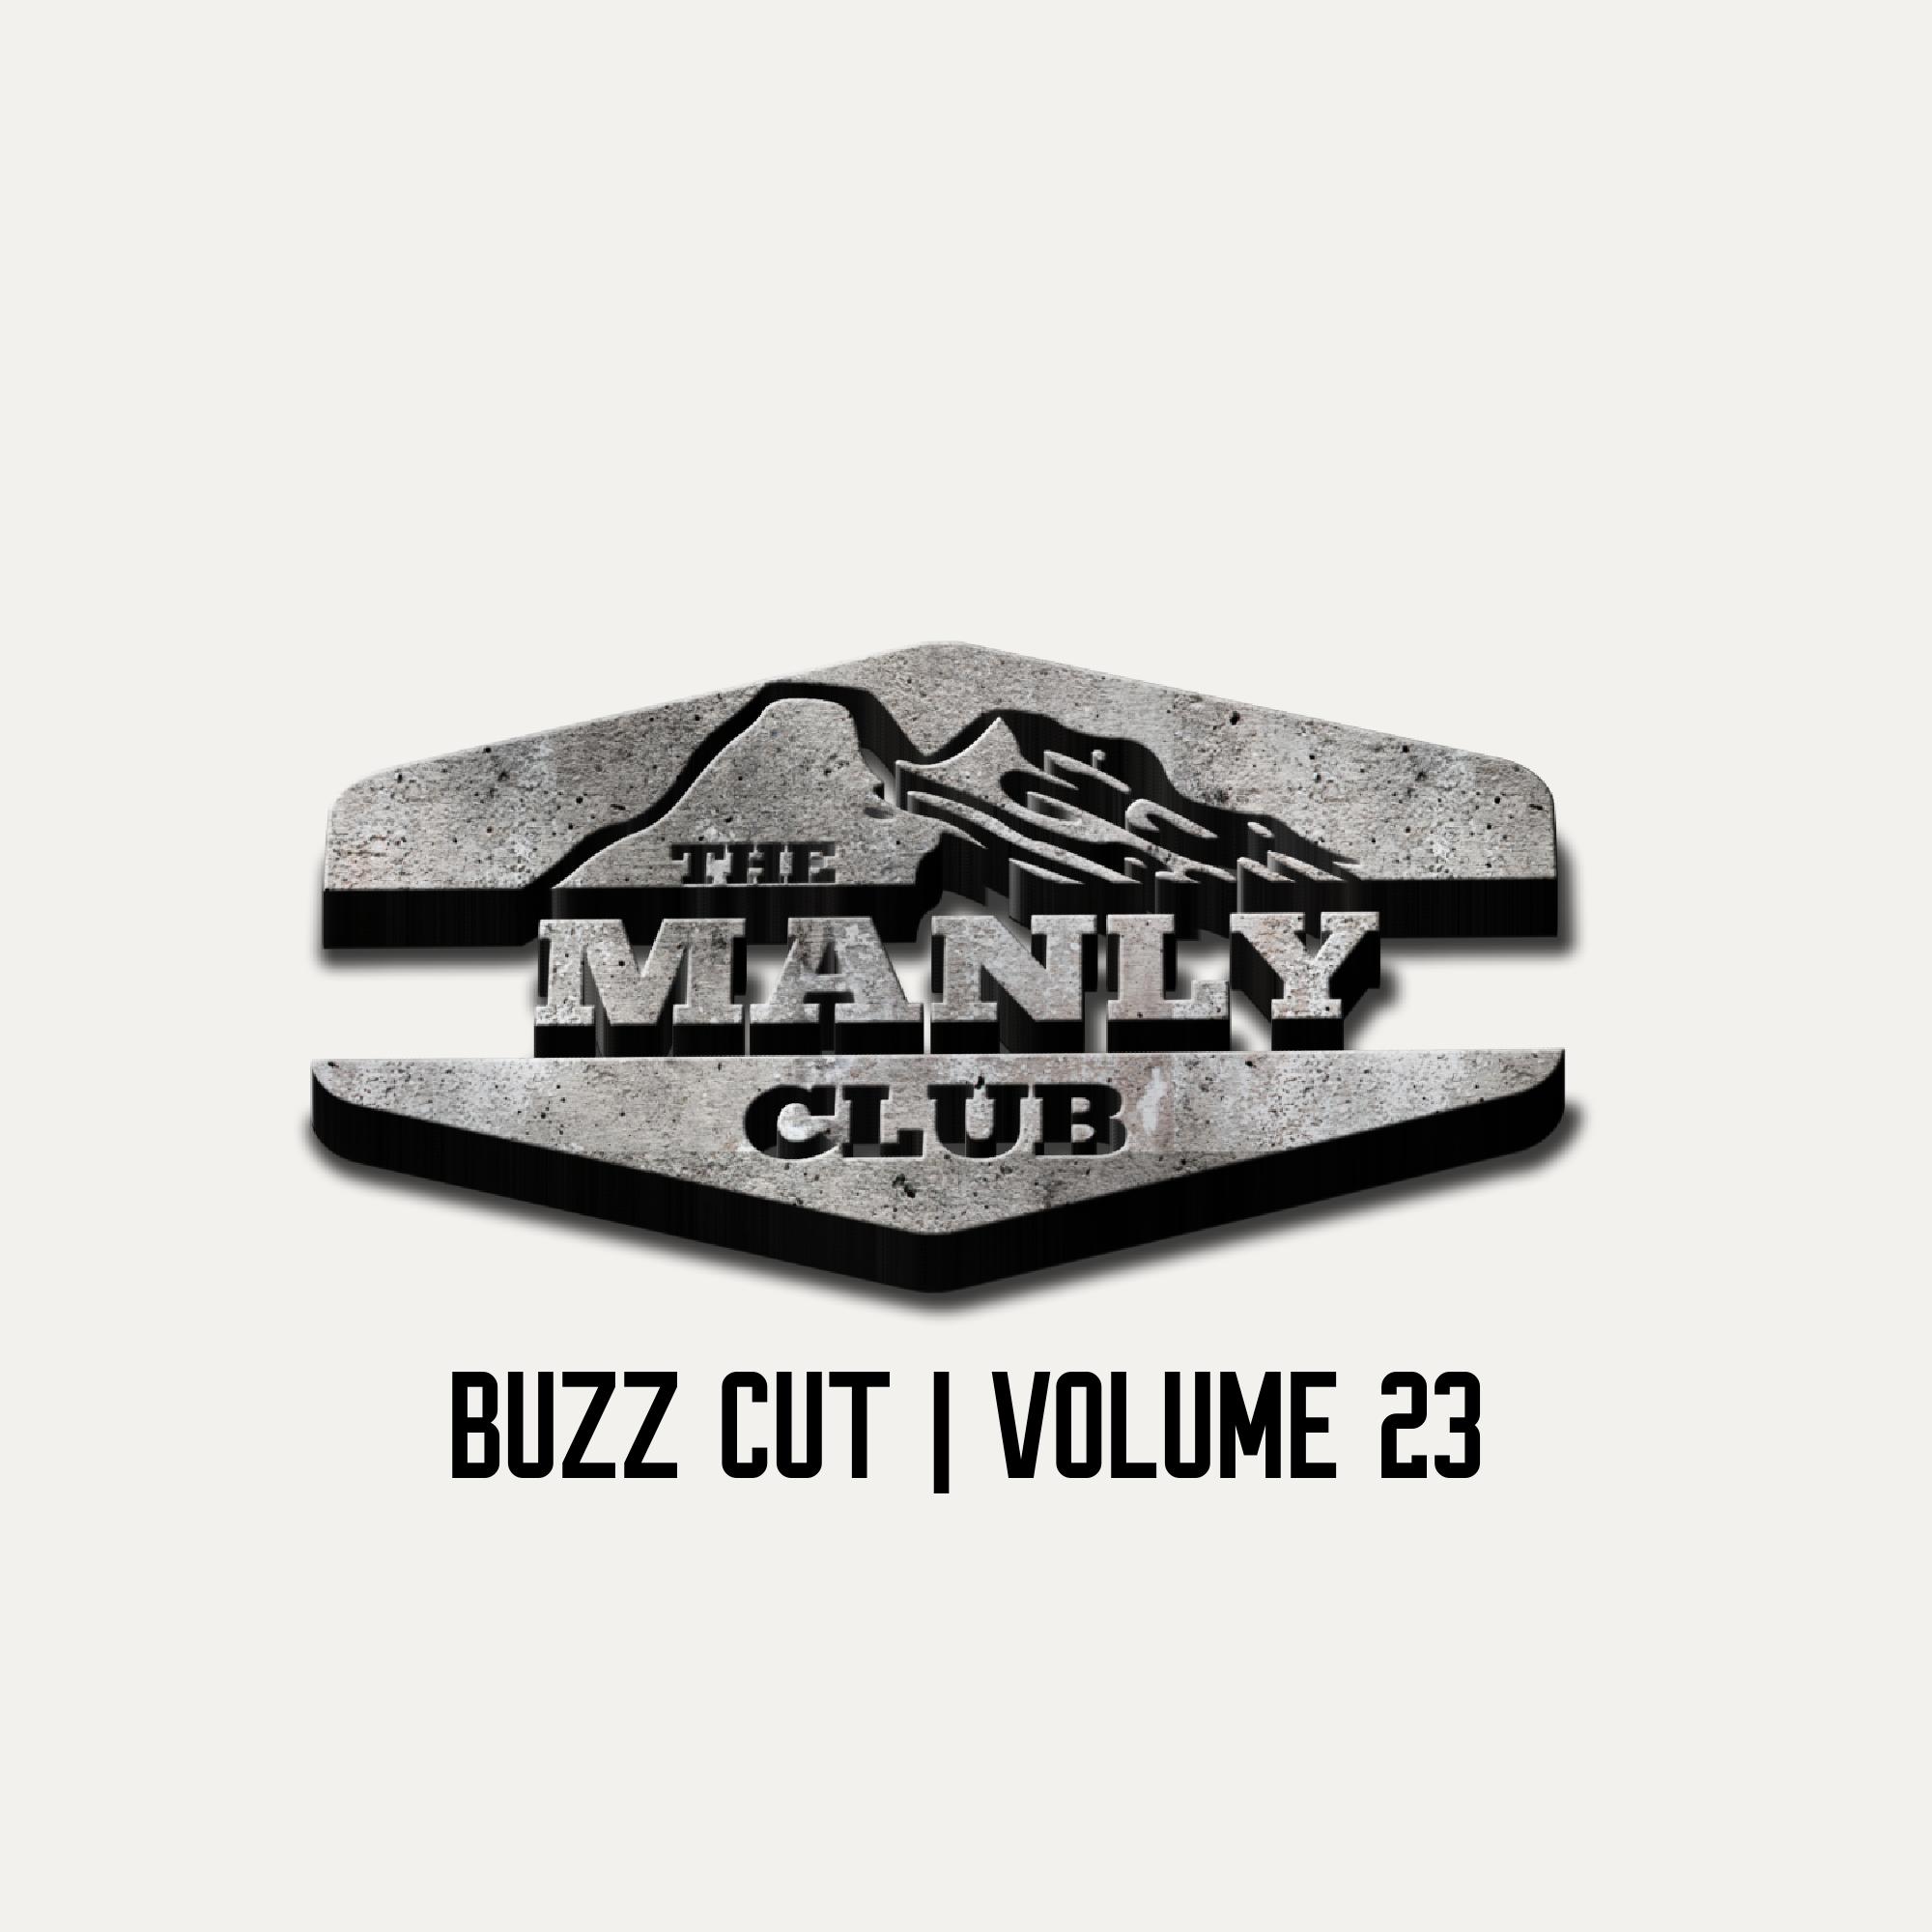 the manly club buzz cut volume 23